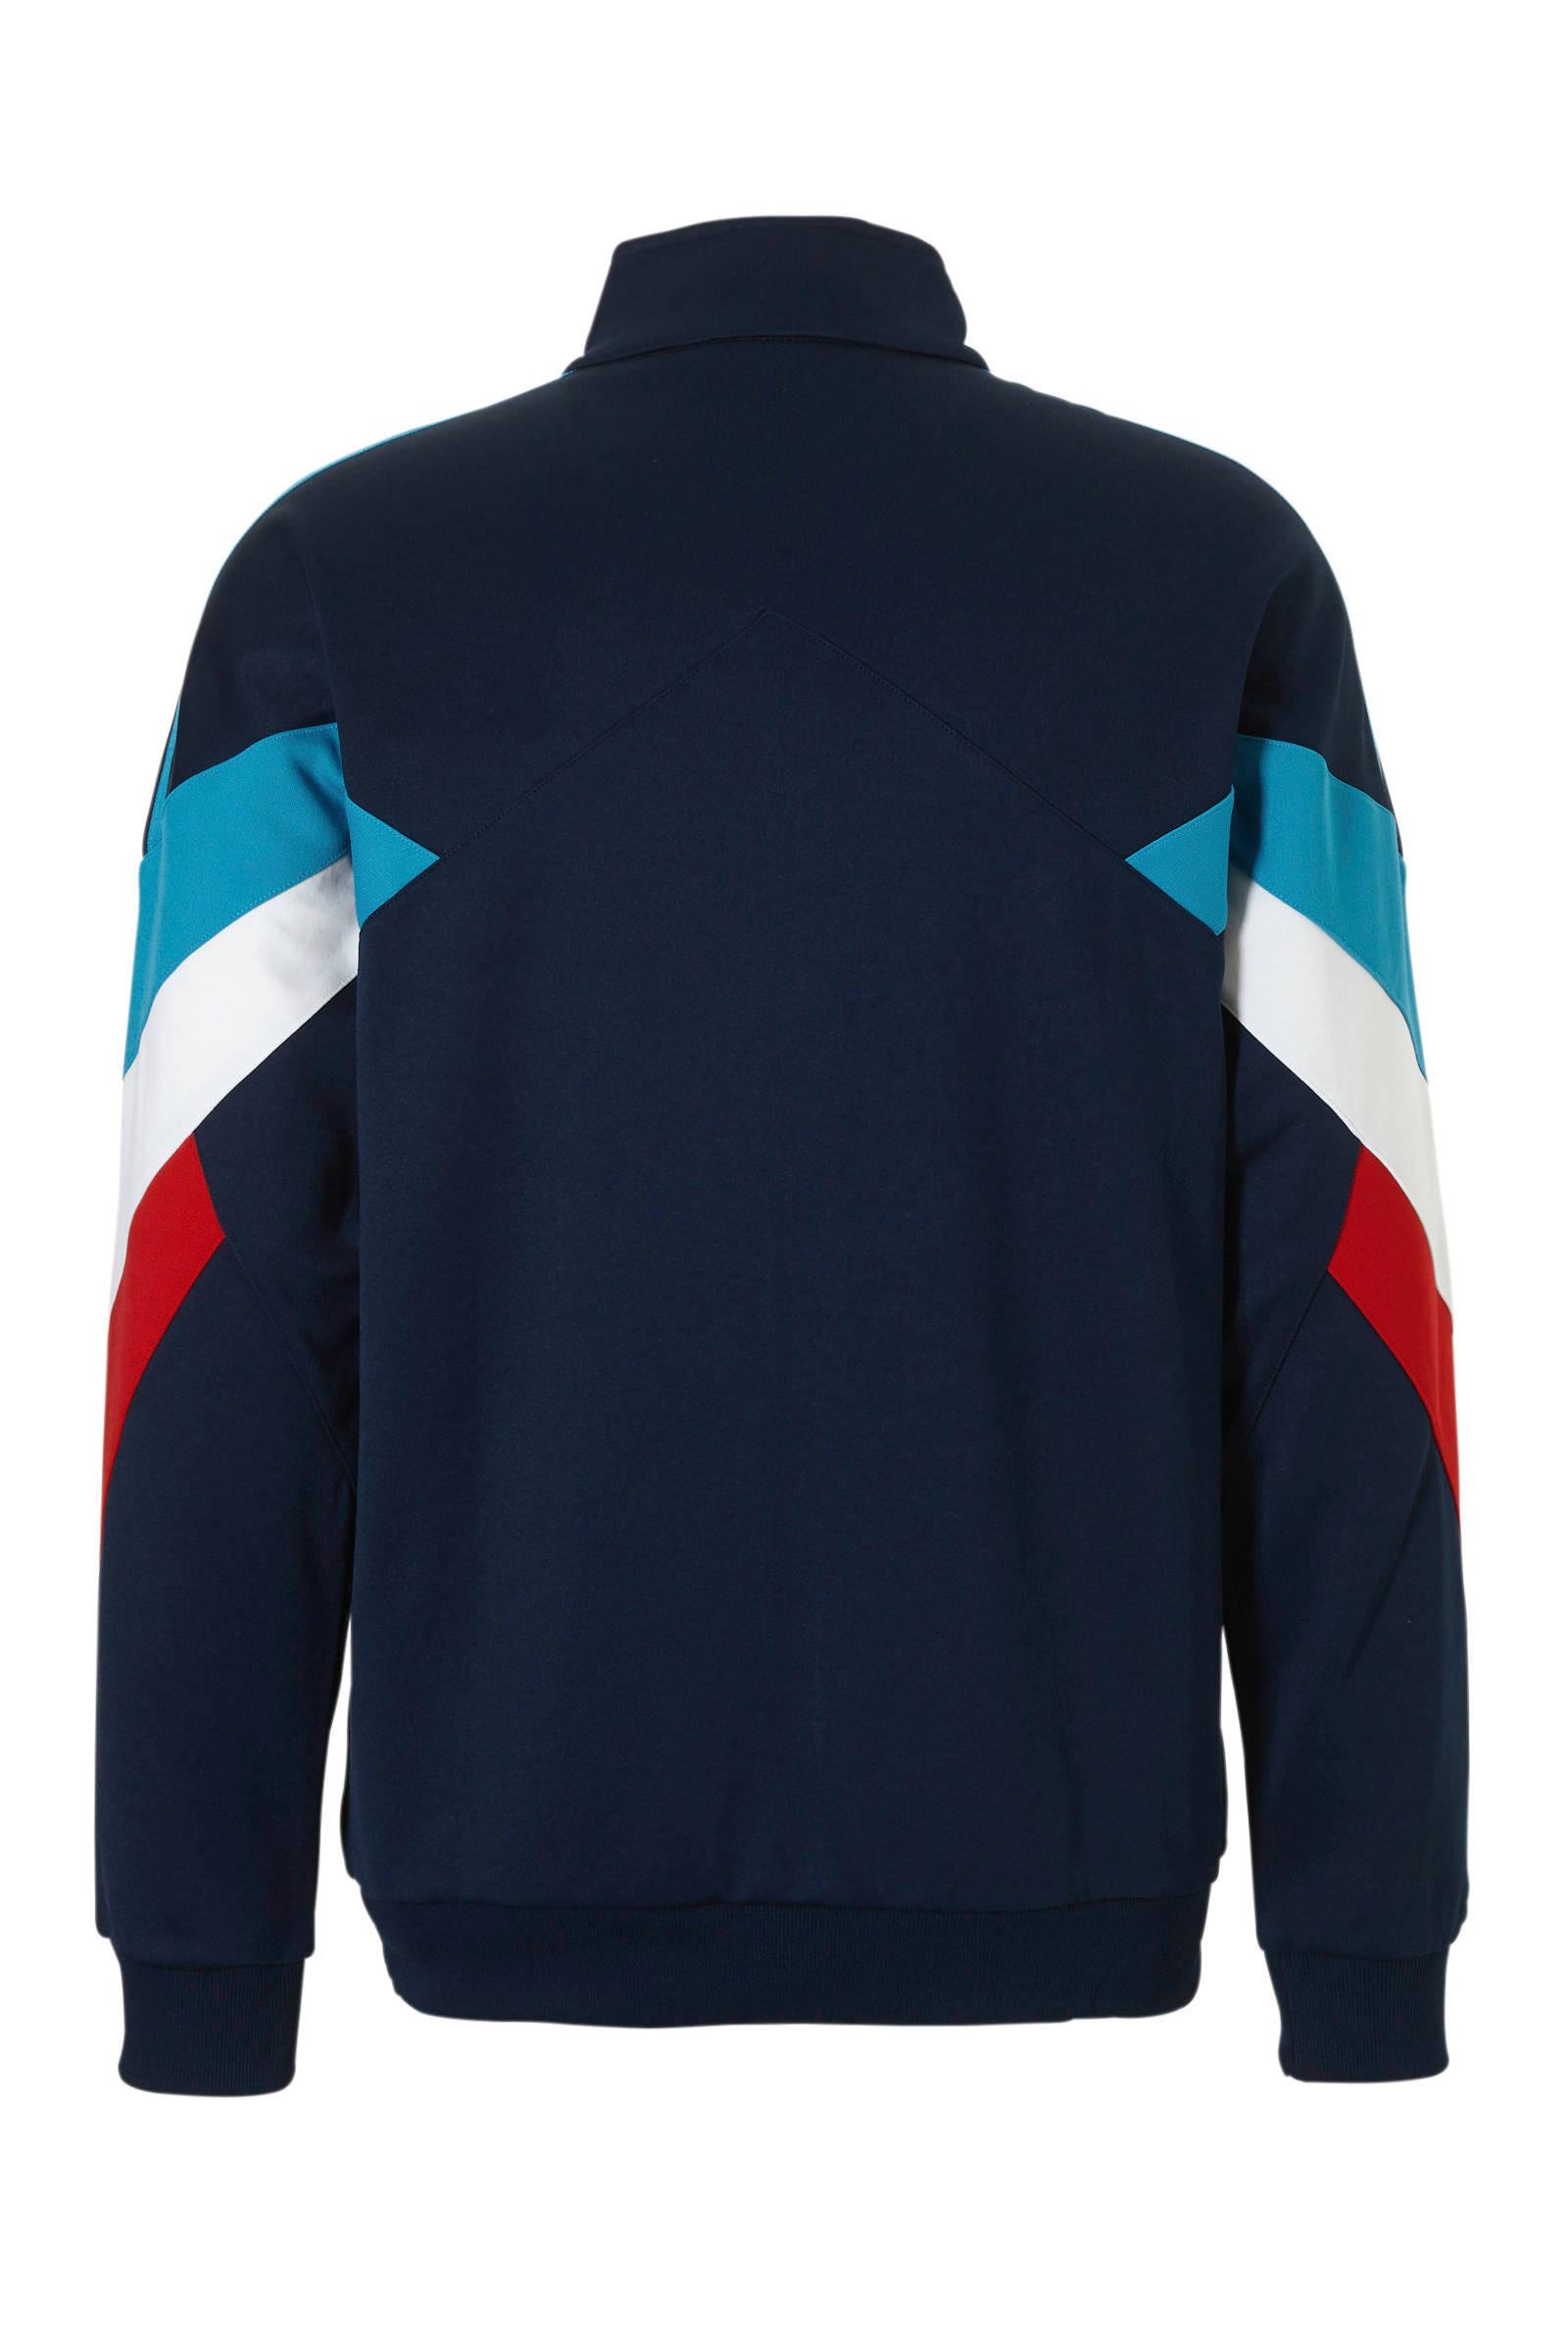 Vest Tt Herenkleding Originals Adidas Palmeston Marine rtshQdC